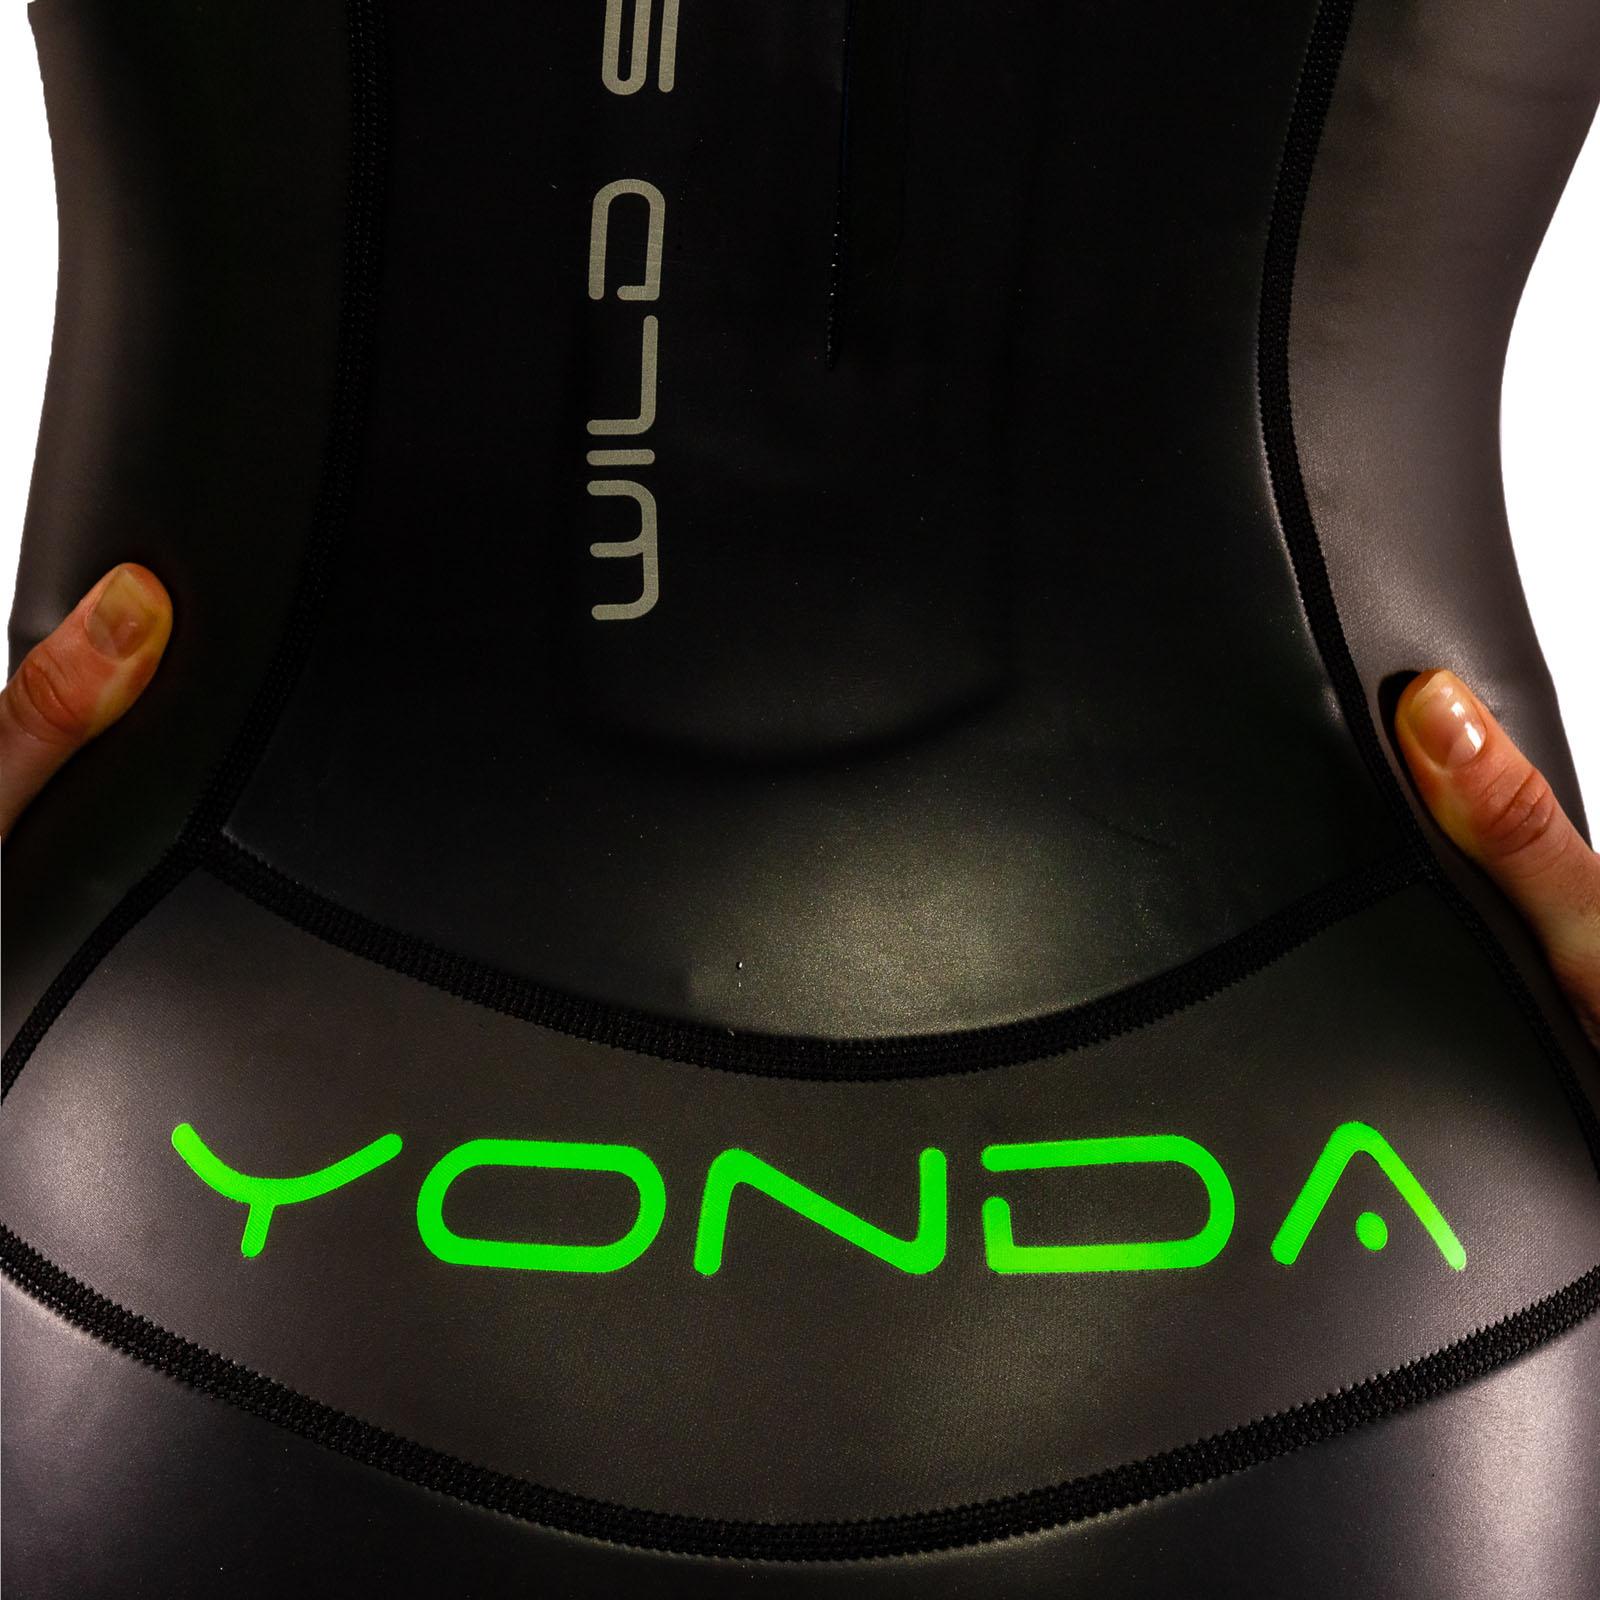 Yonda Spook Wetsuit - Women's Wetsuit | Clearance